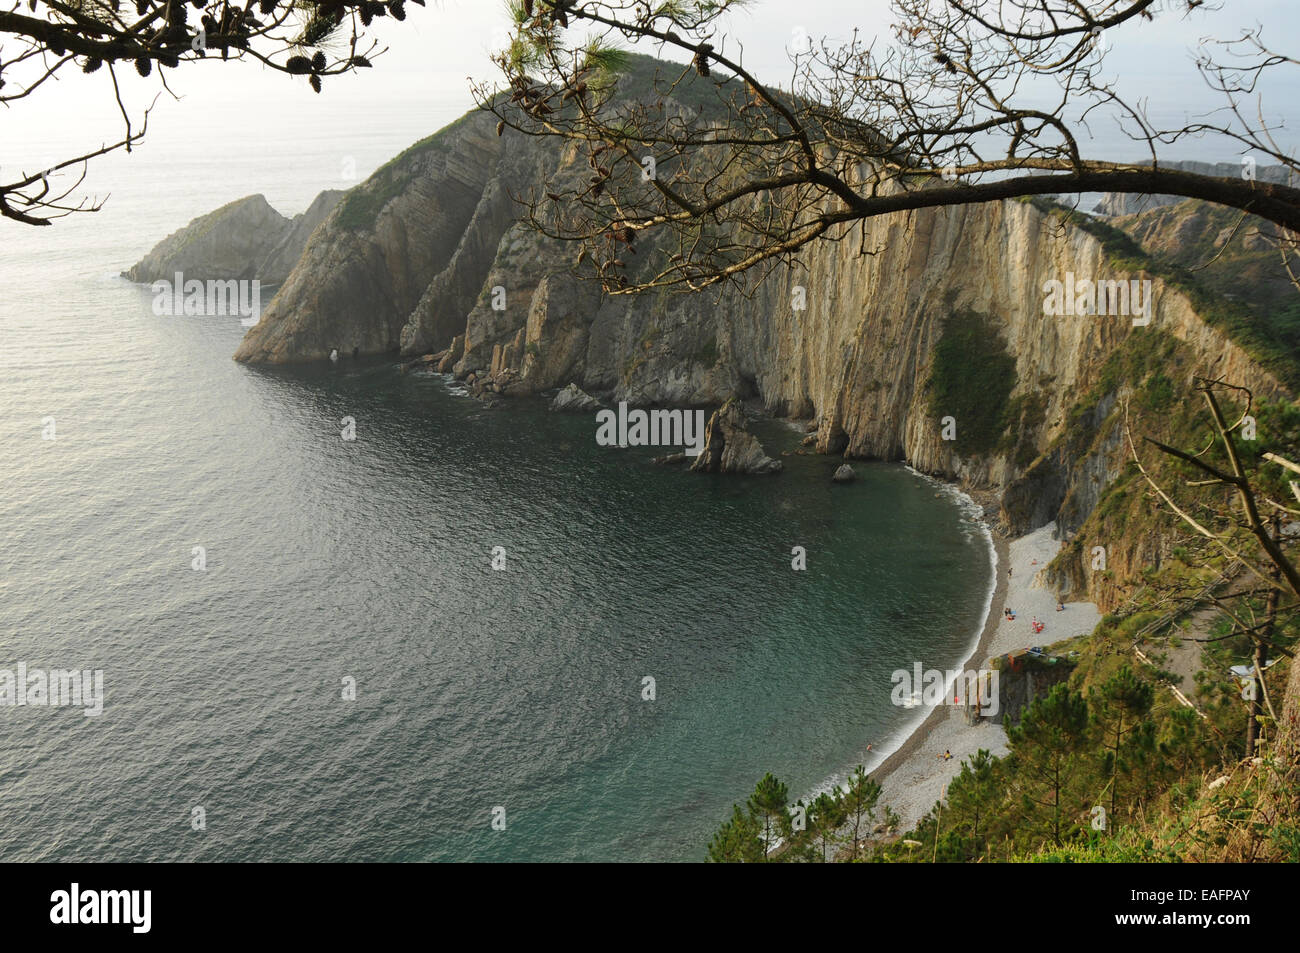 Playa del Silencio, Asturias, España. Stockbild